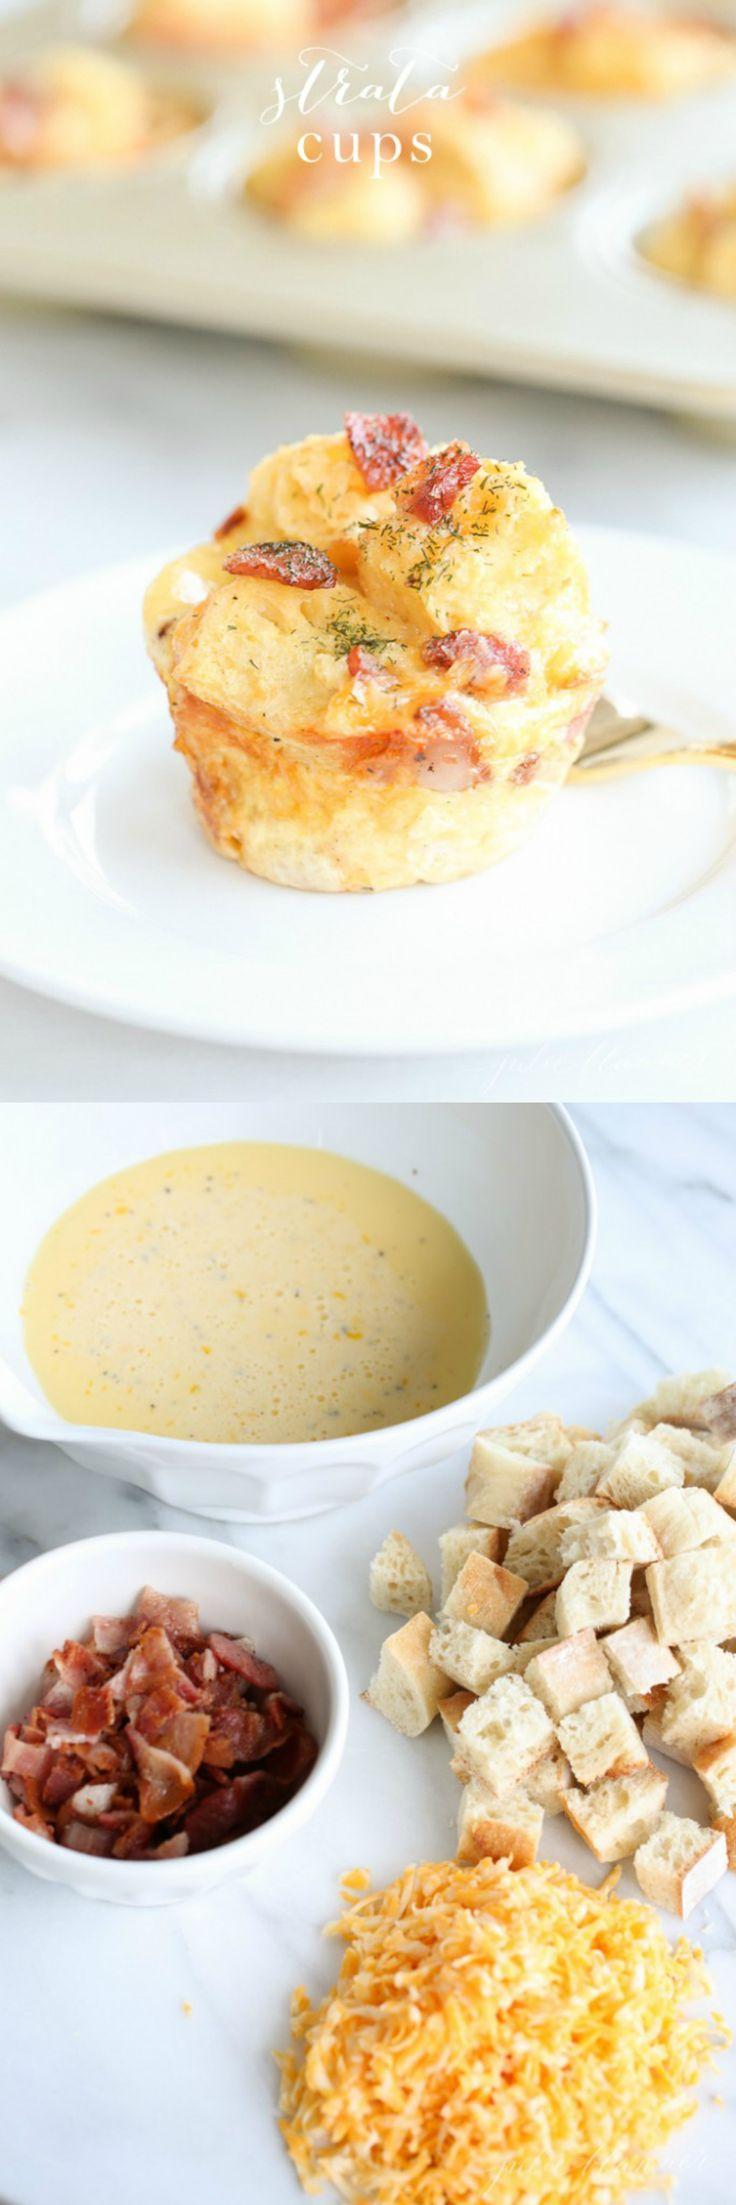 Mini Breakfast Strata - easy to make brunch recipe